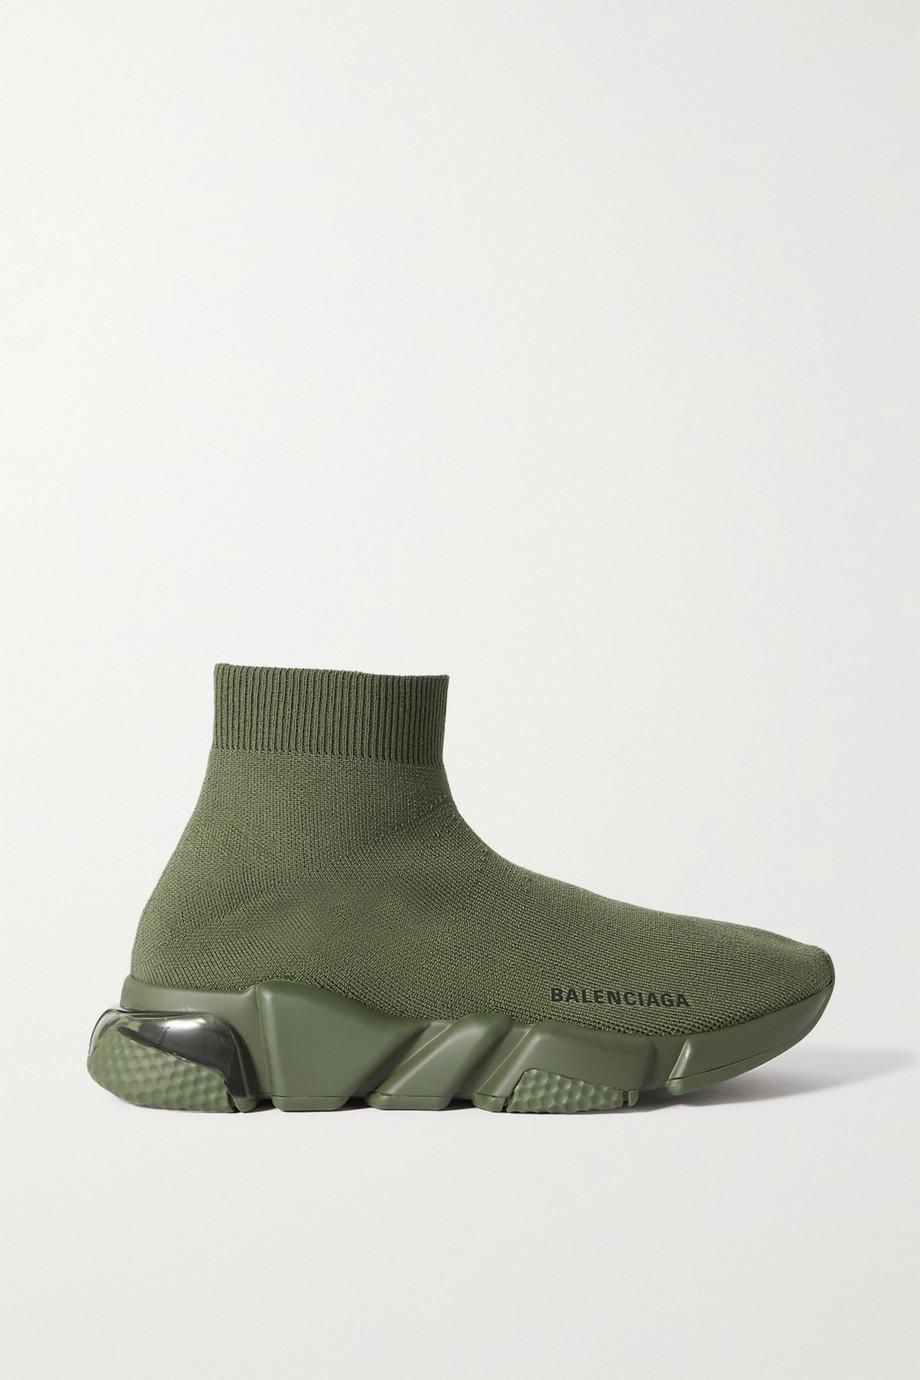 Balenciaga Speed LT logo-print stretch-knit high-top sneakers